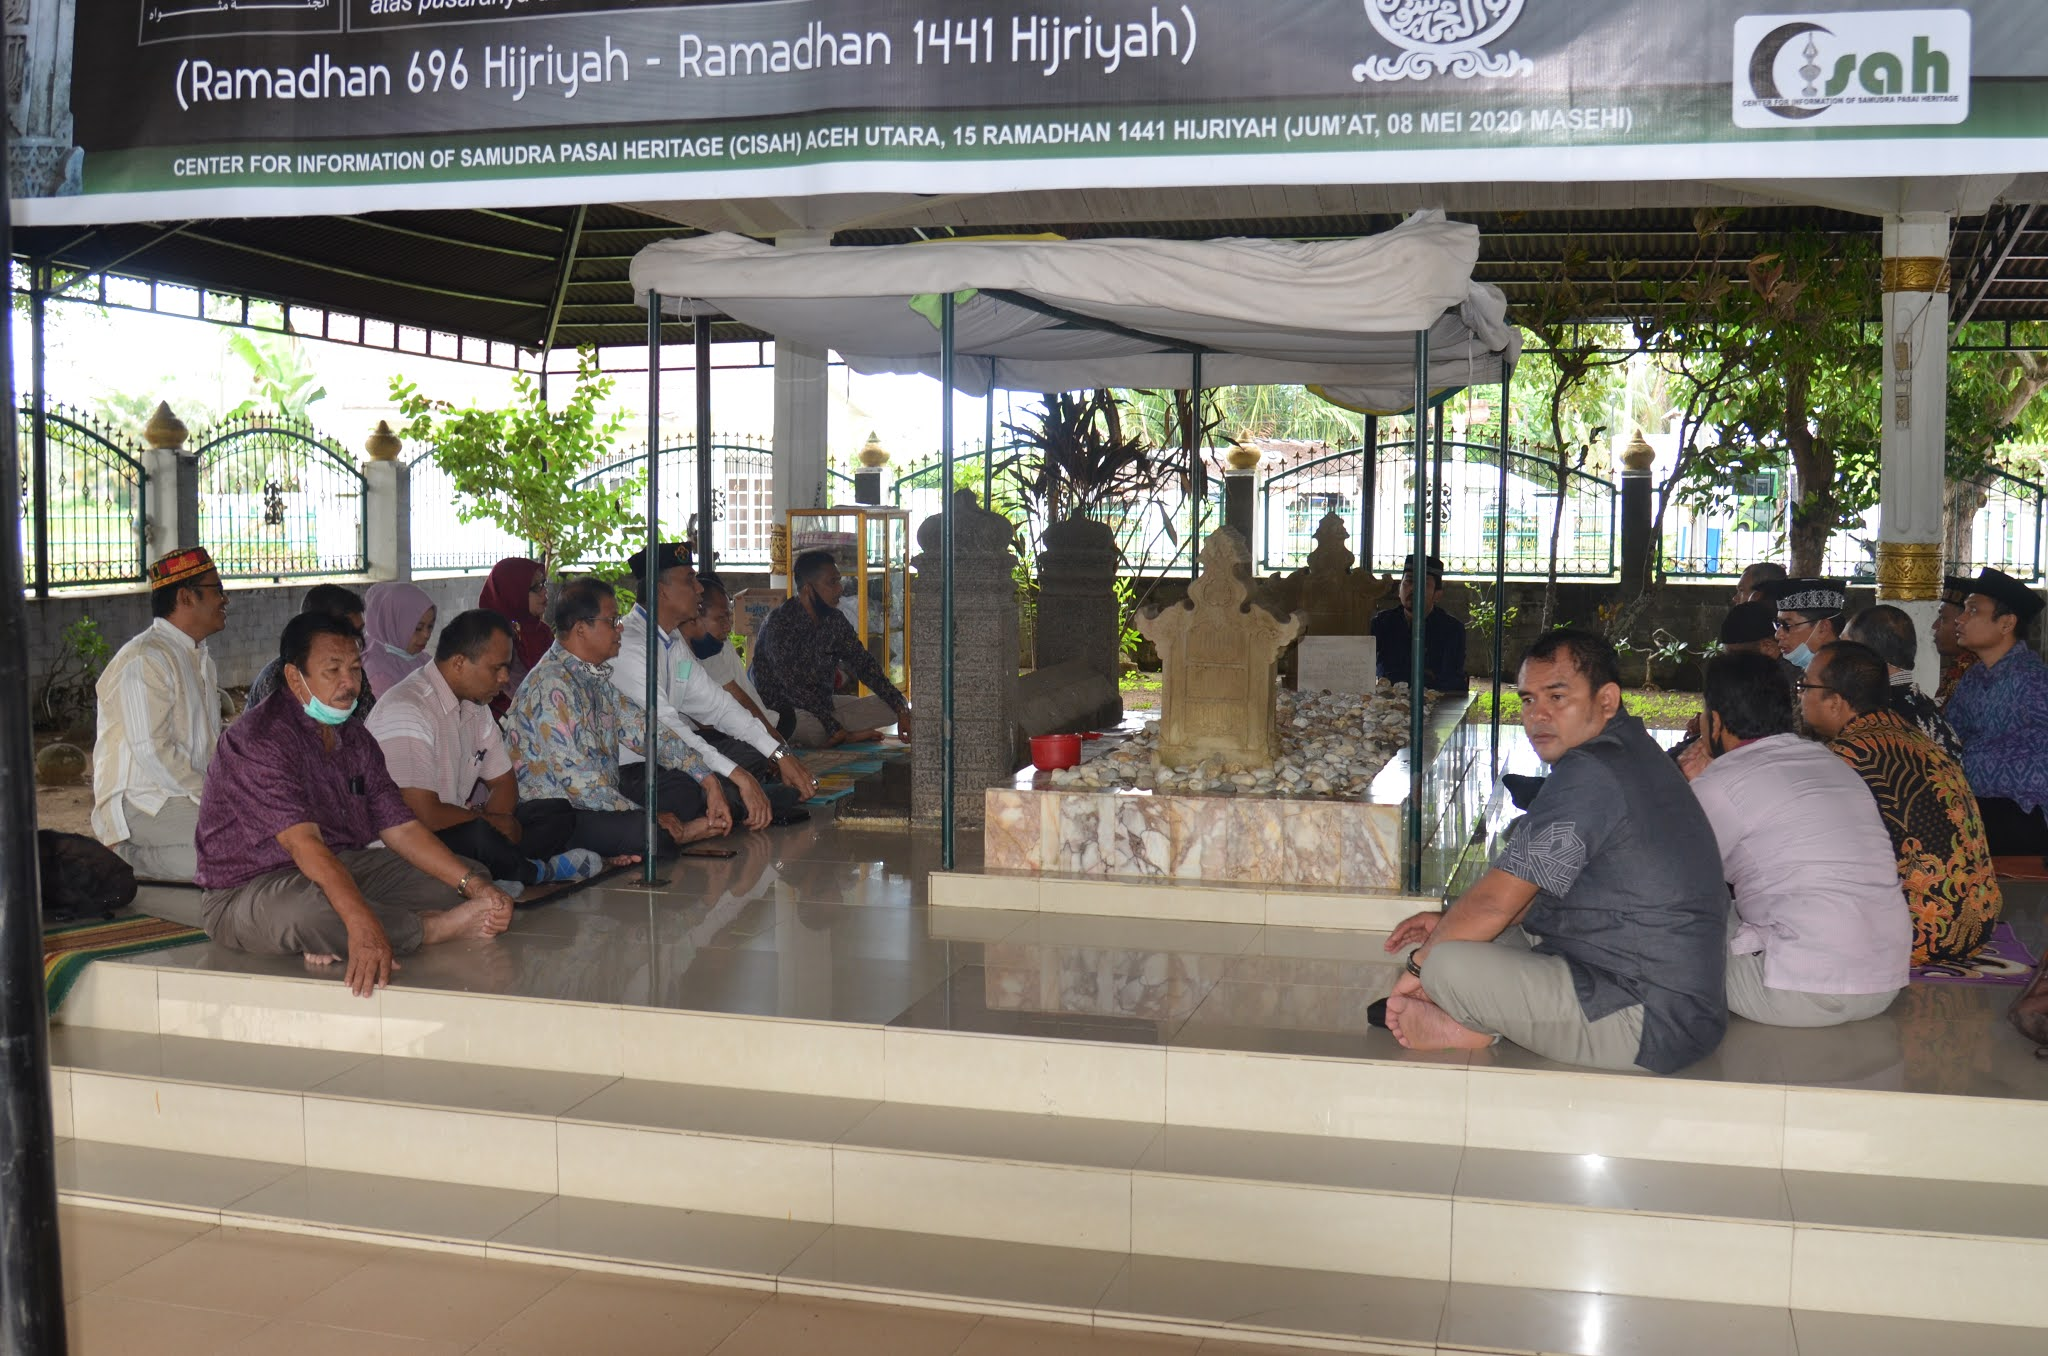 Makam Sultan Iskandar Muda Objek Wisata Religi Penuh Sejarah Kegemilangan Aceh Sa